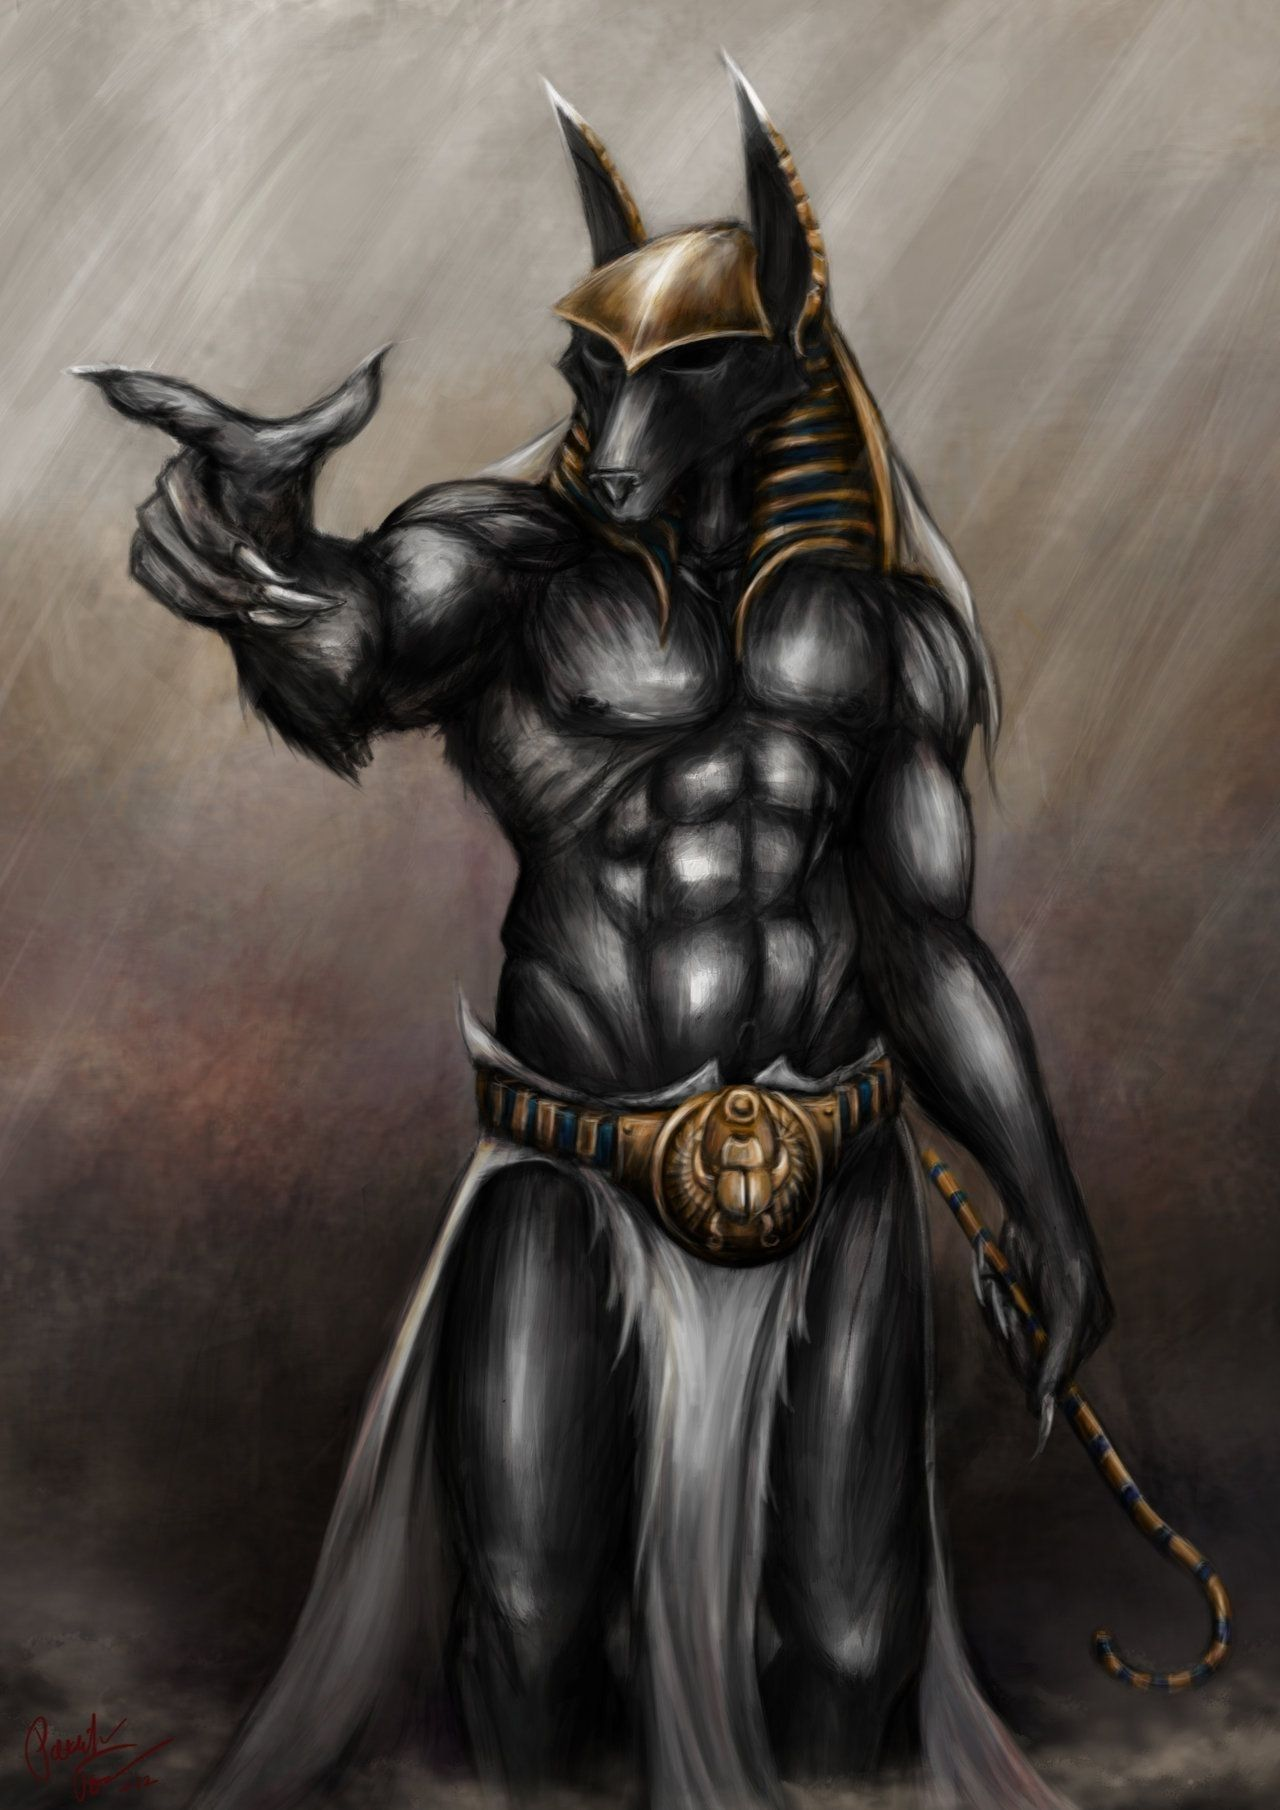 Anubis Egyptian God Wallpapers - Top Free Anubis Egyptian ...